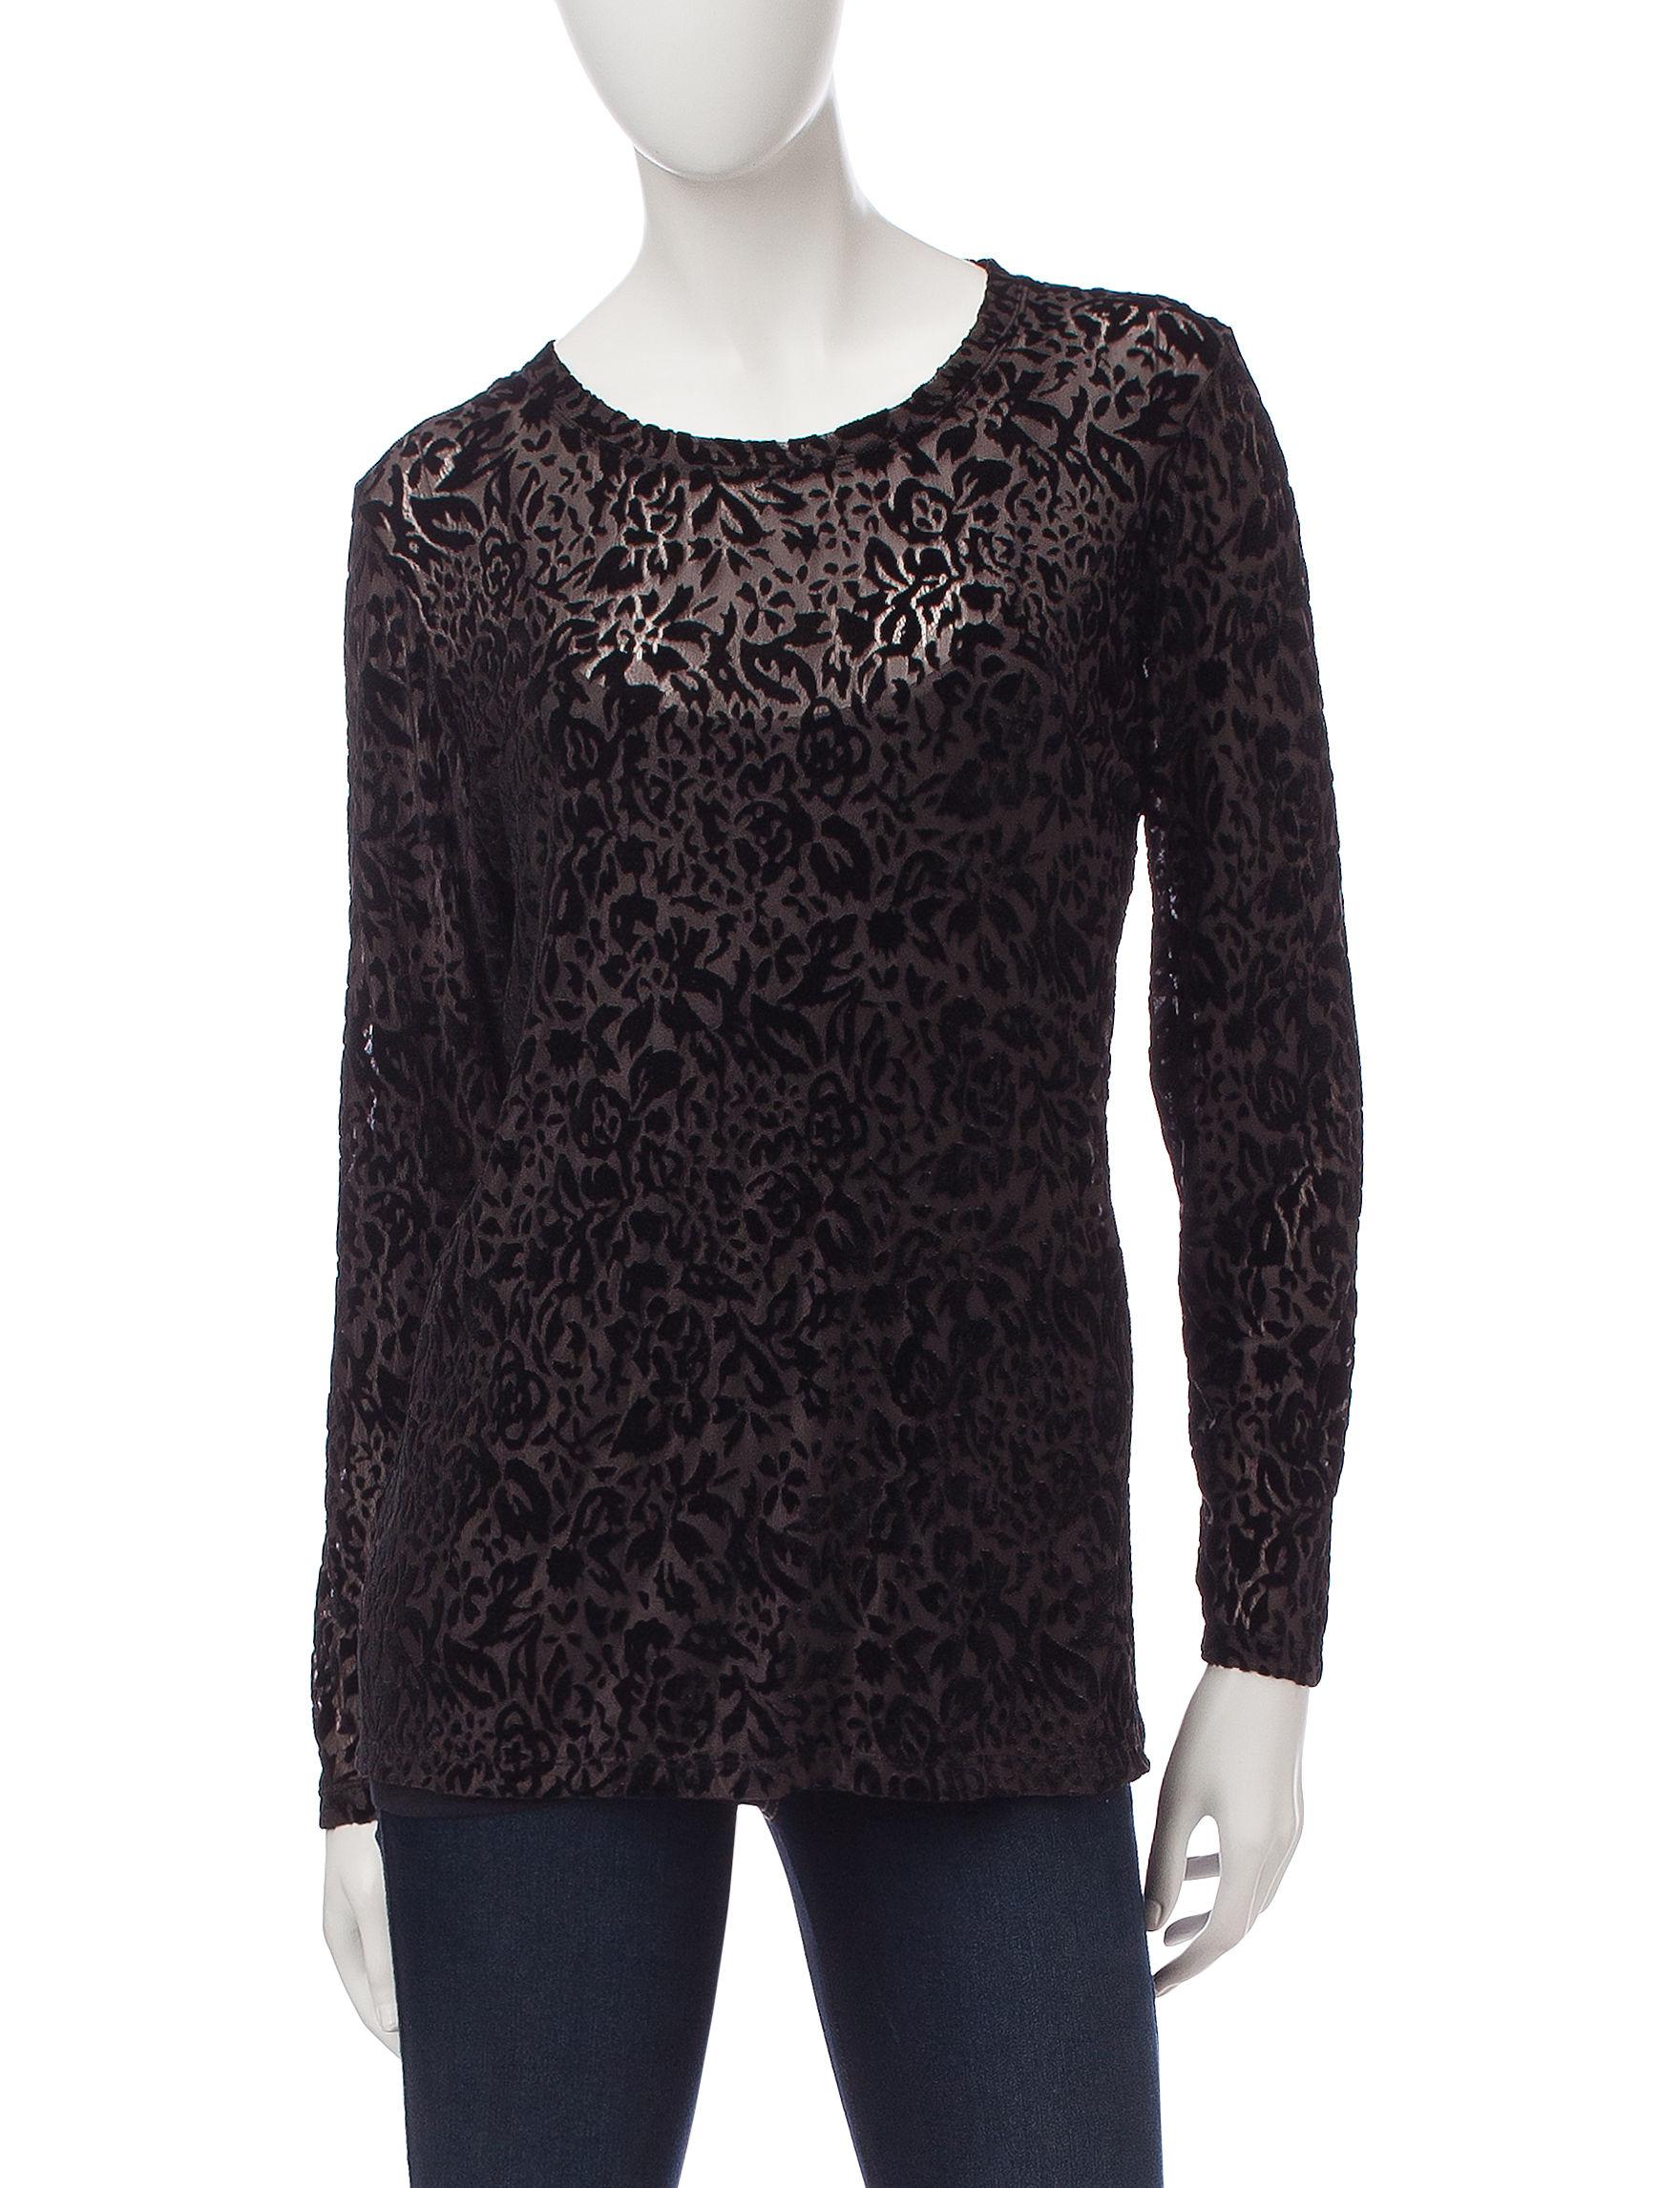 Hannah Black Pull-overs Shirts & Blouses